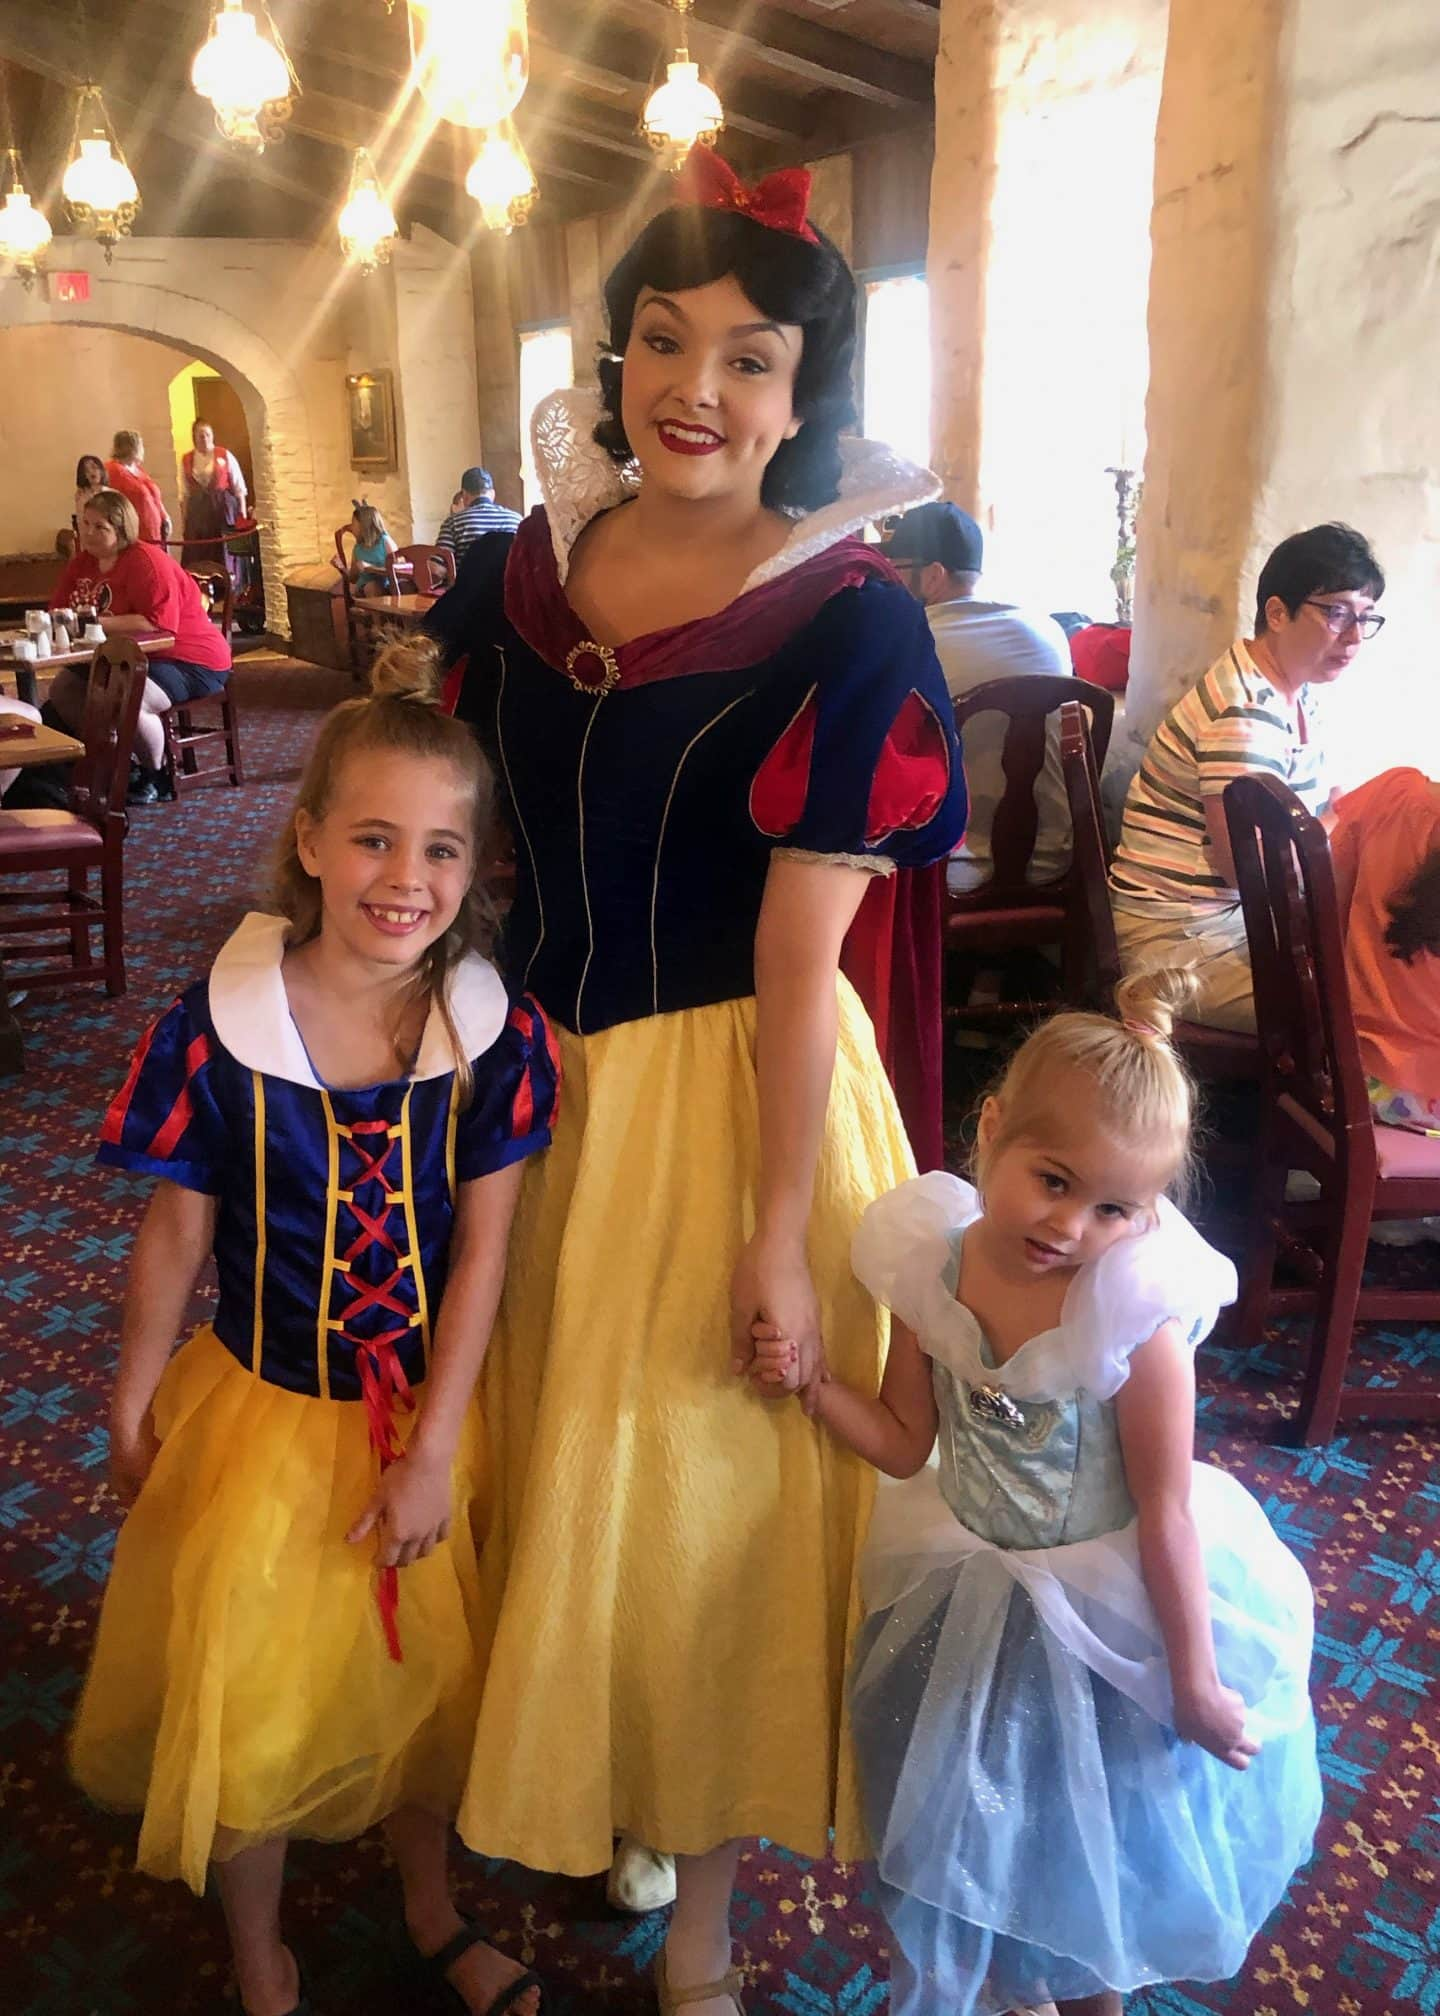 Snow White at Akershus Epcot